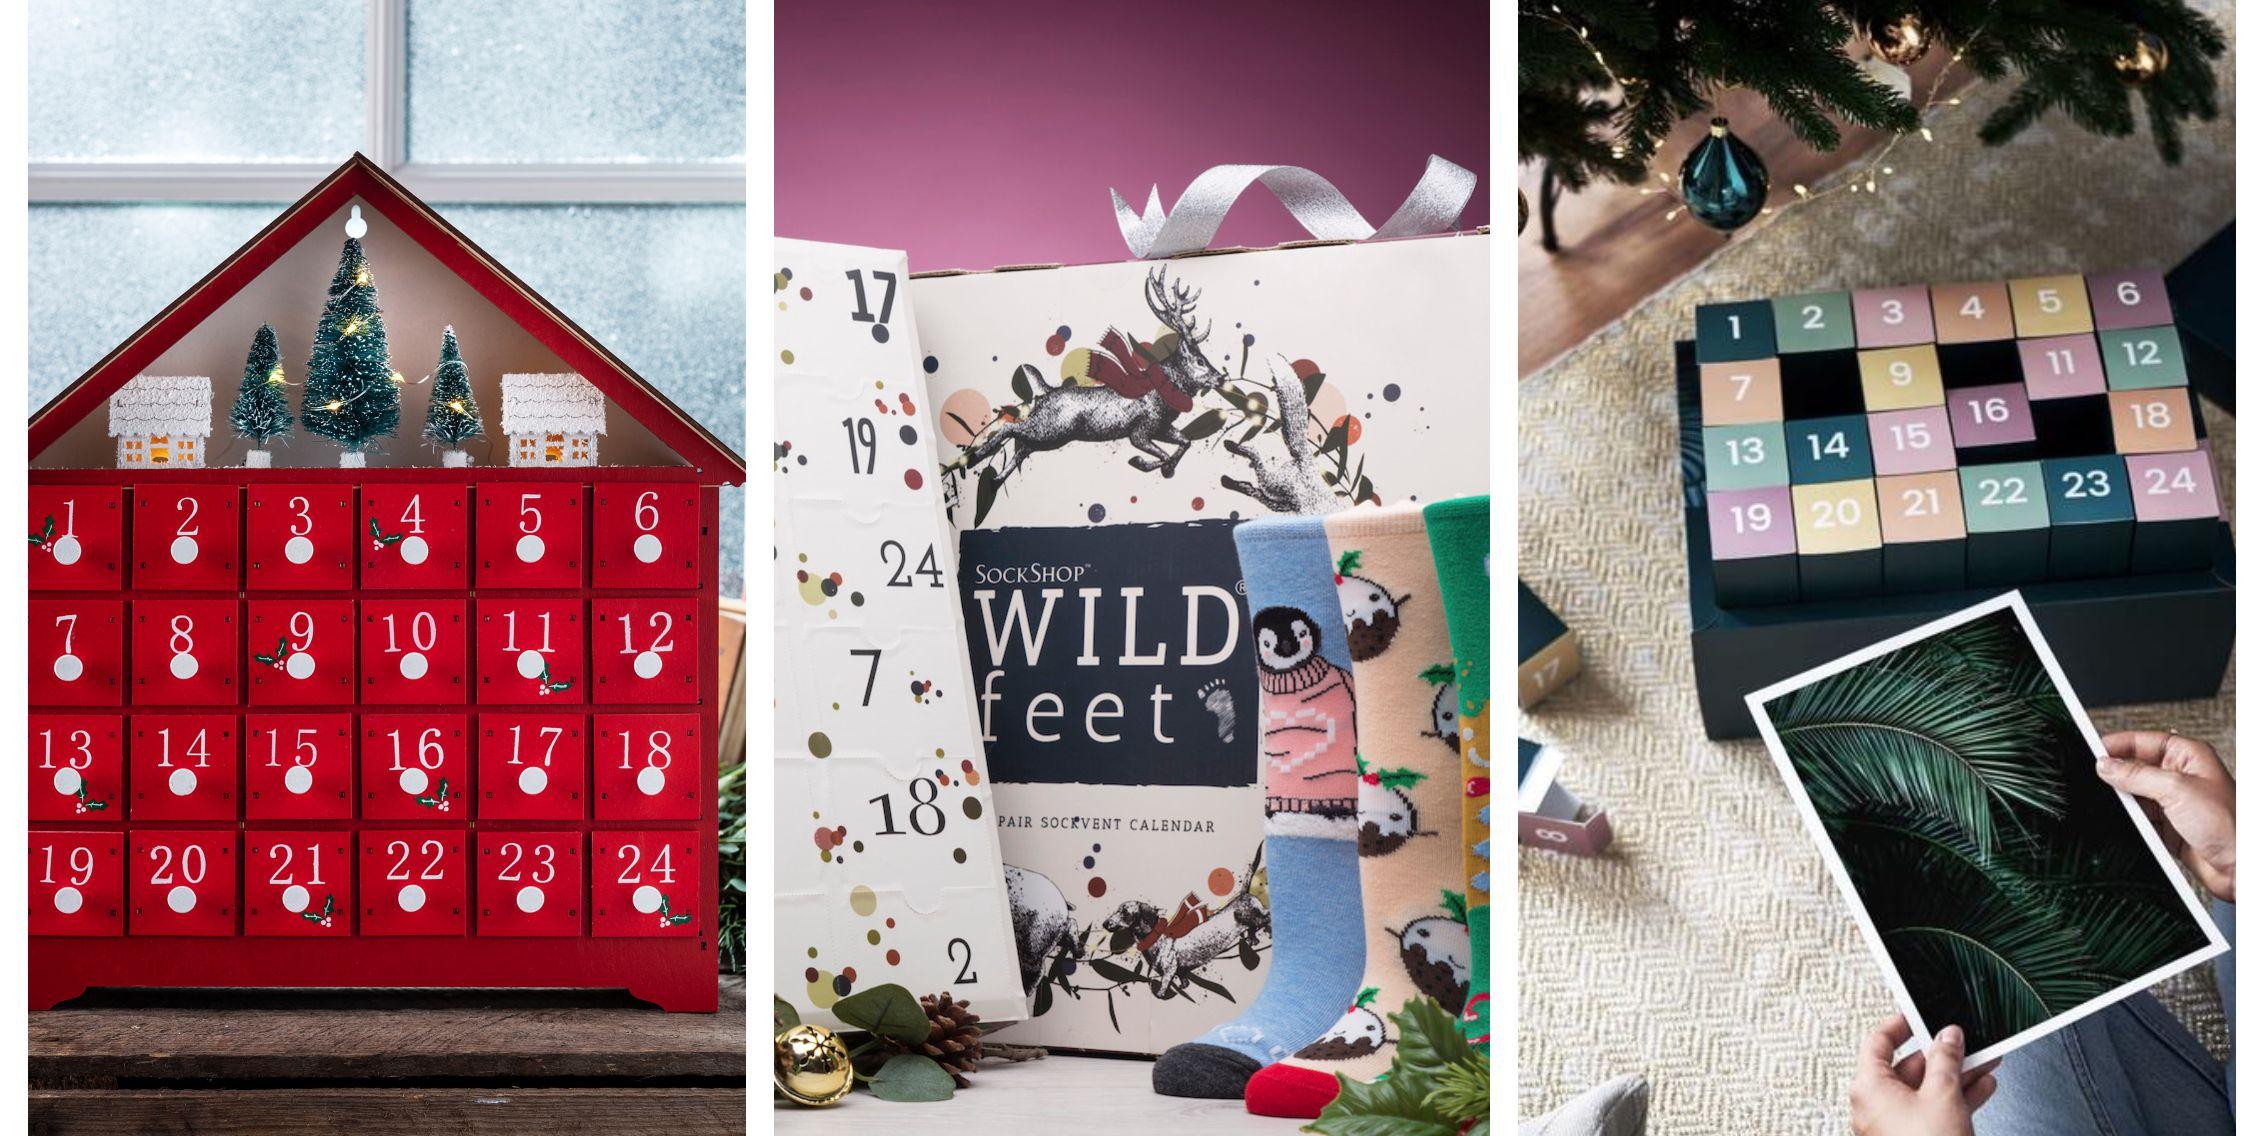 The best alternative advent calendars for Christmas